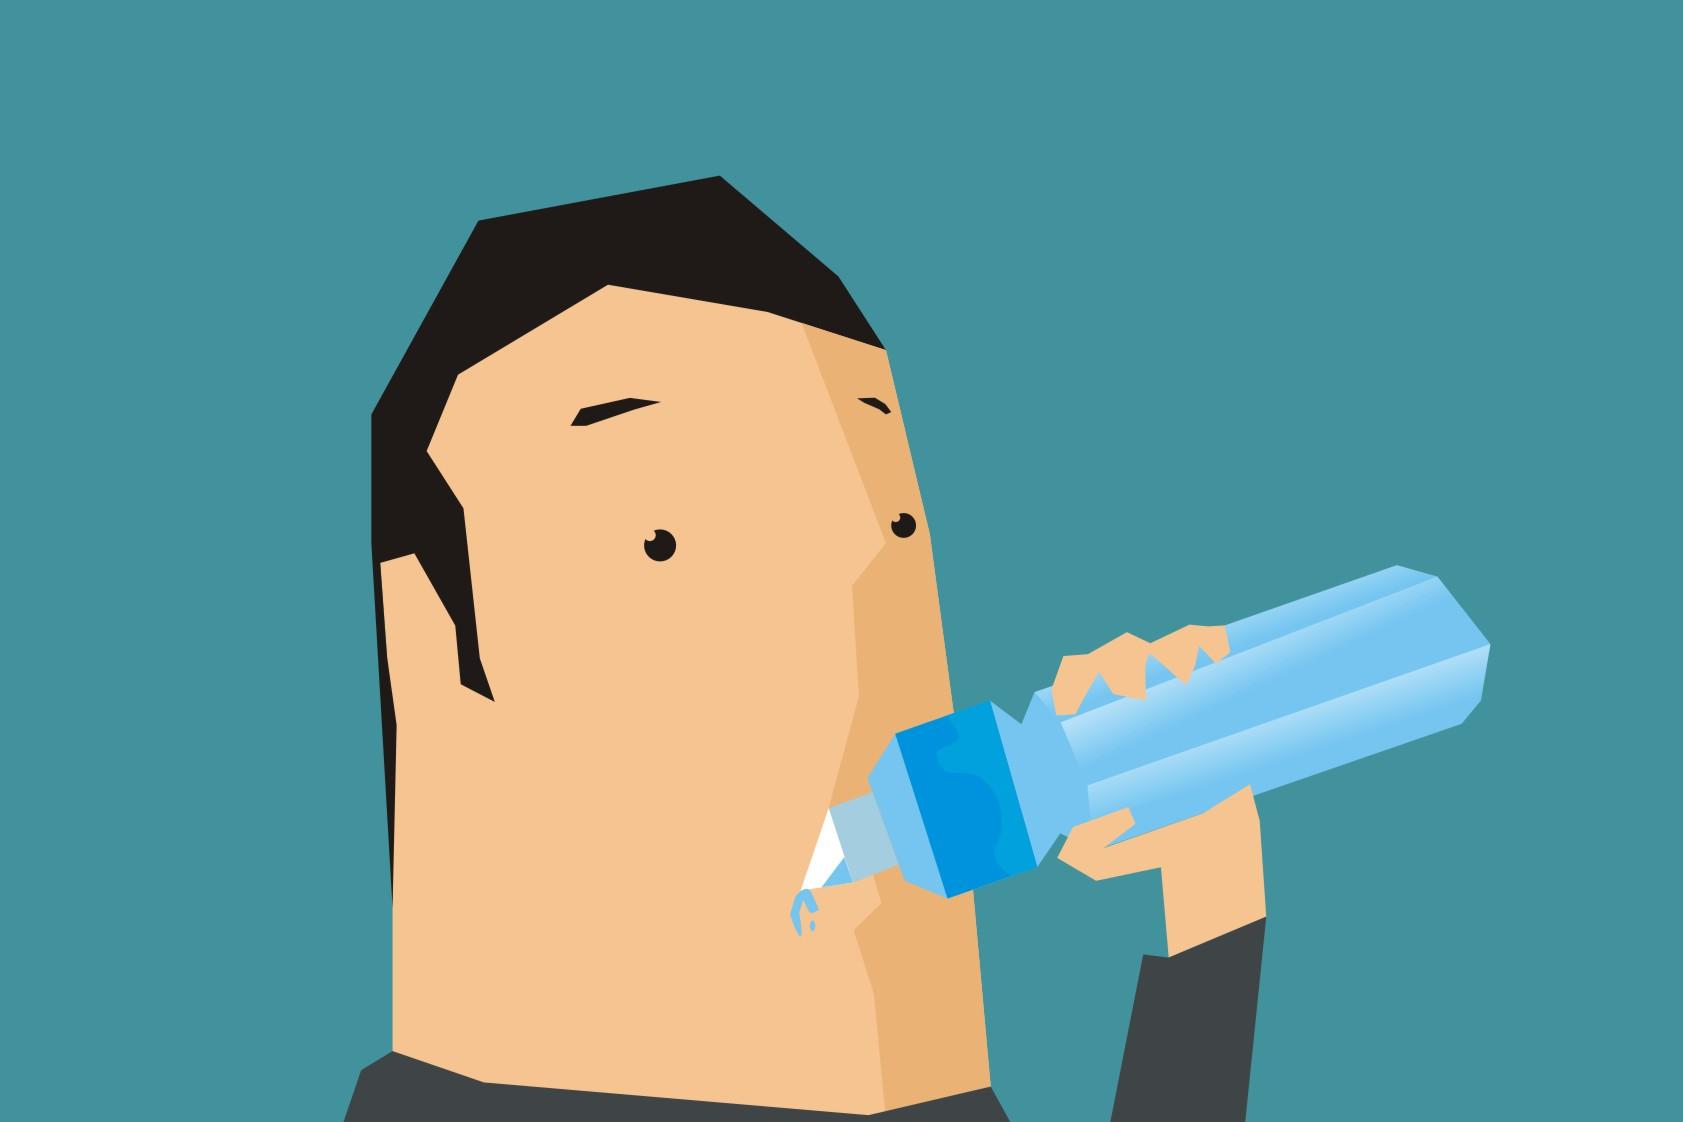 Waspada Bahaya Dehidrasi Bagi Tubuh, Khususnya Pada Otak